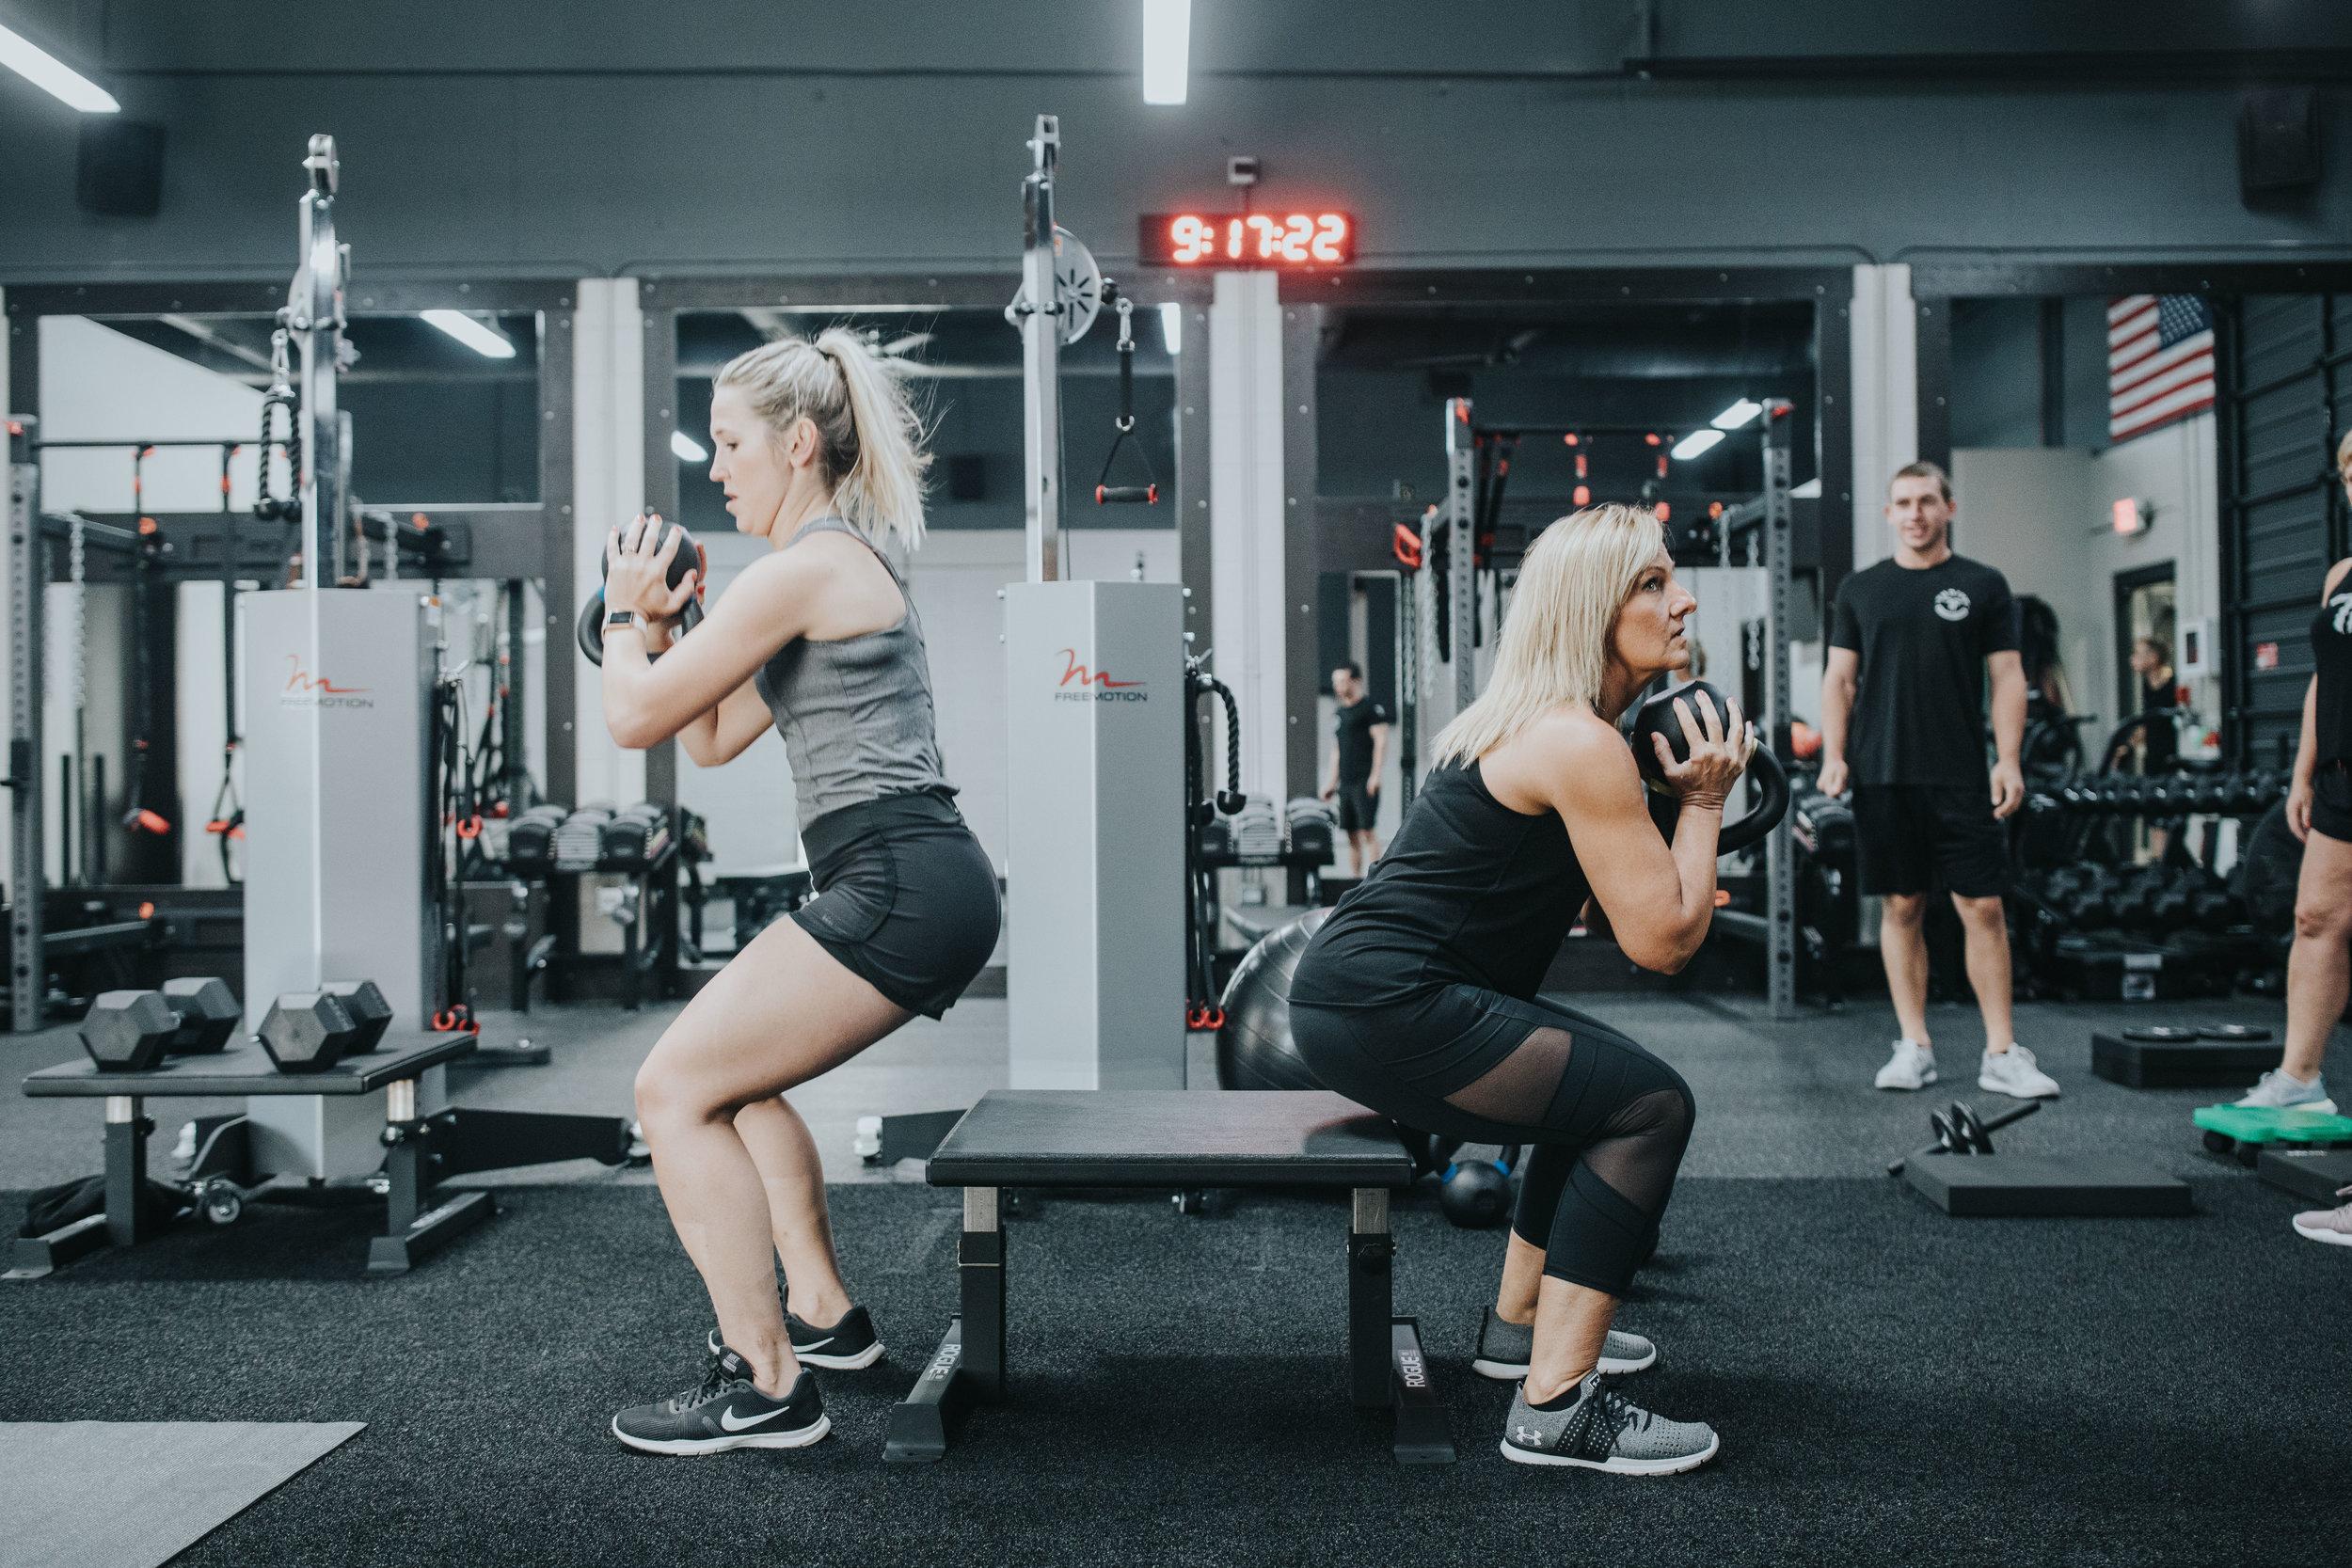 Thrive-Gym-333.jpg